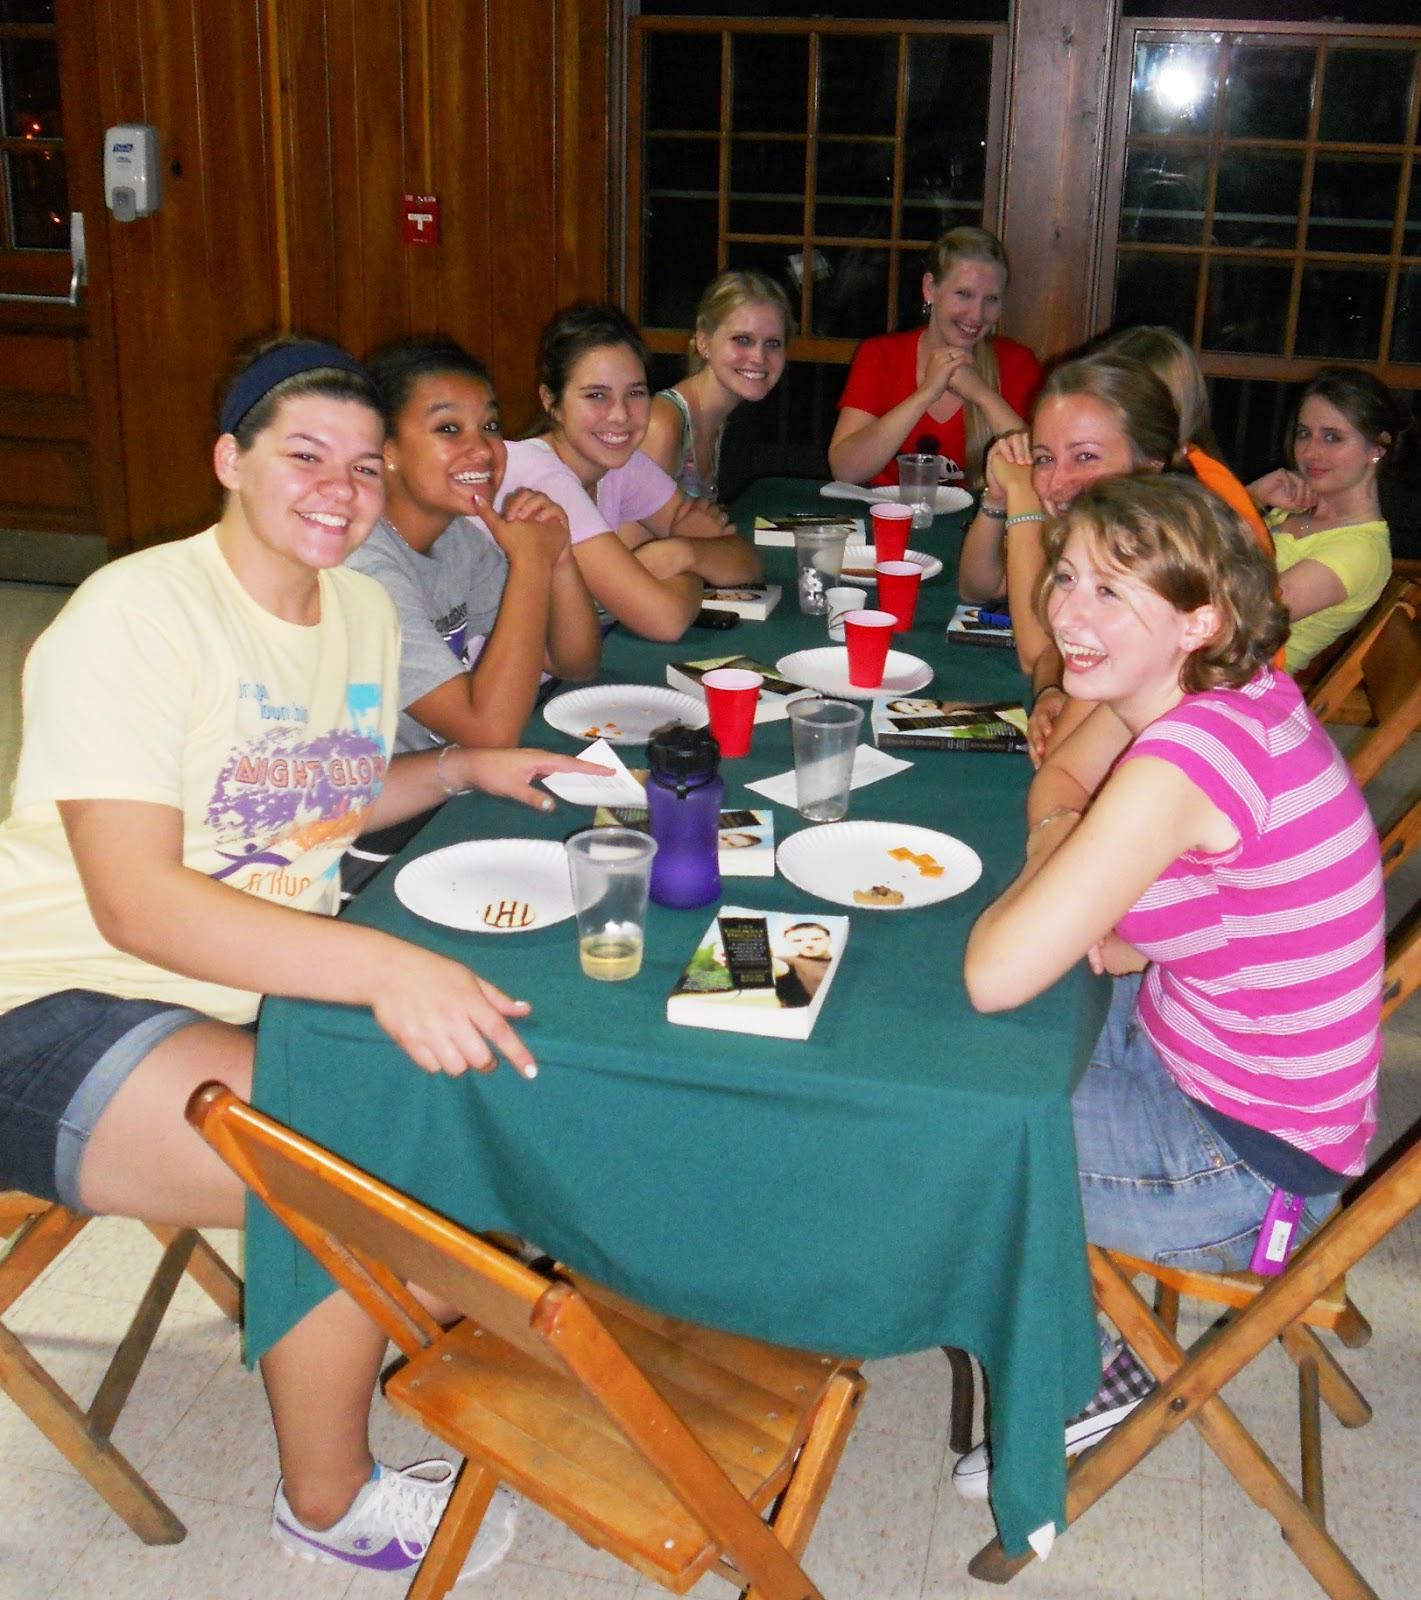 5th Annual Honors Program Retreat at Camp Nuhop